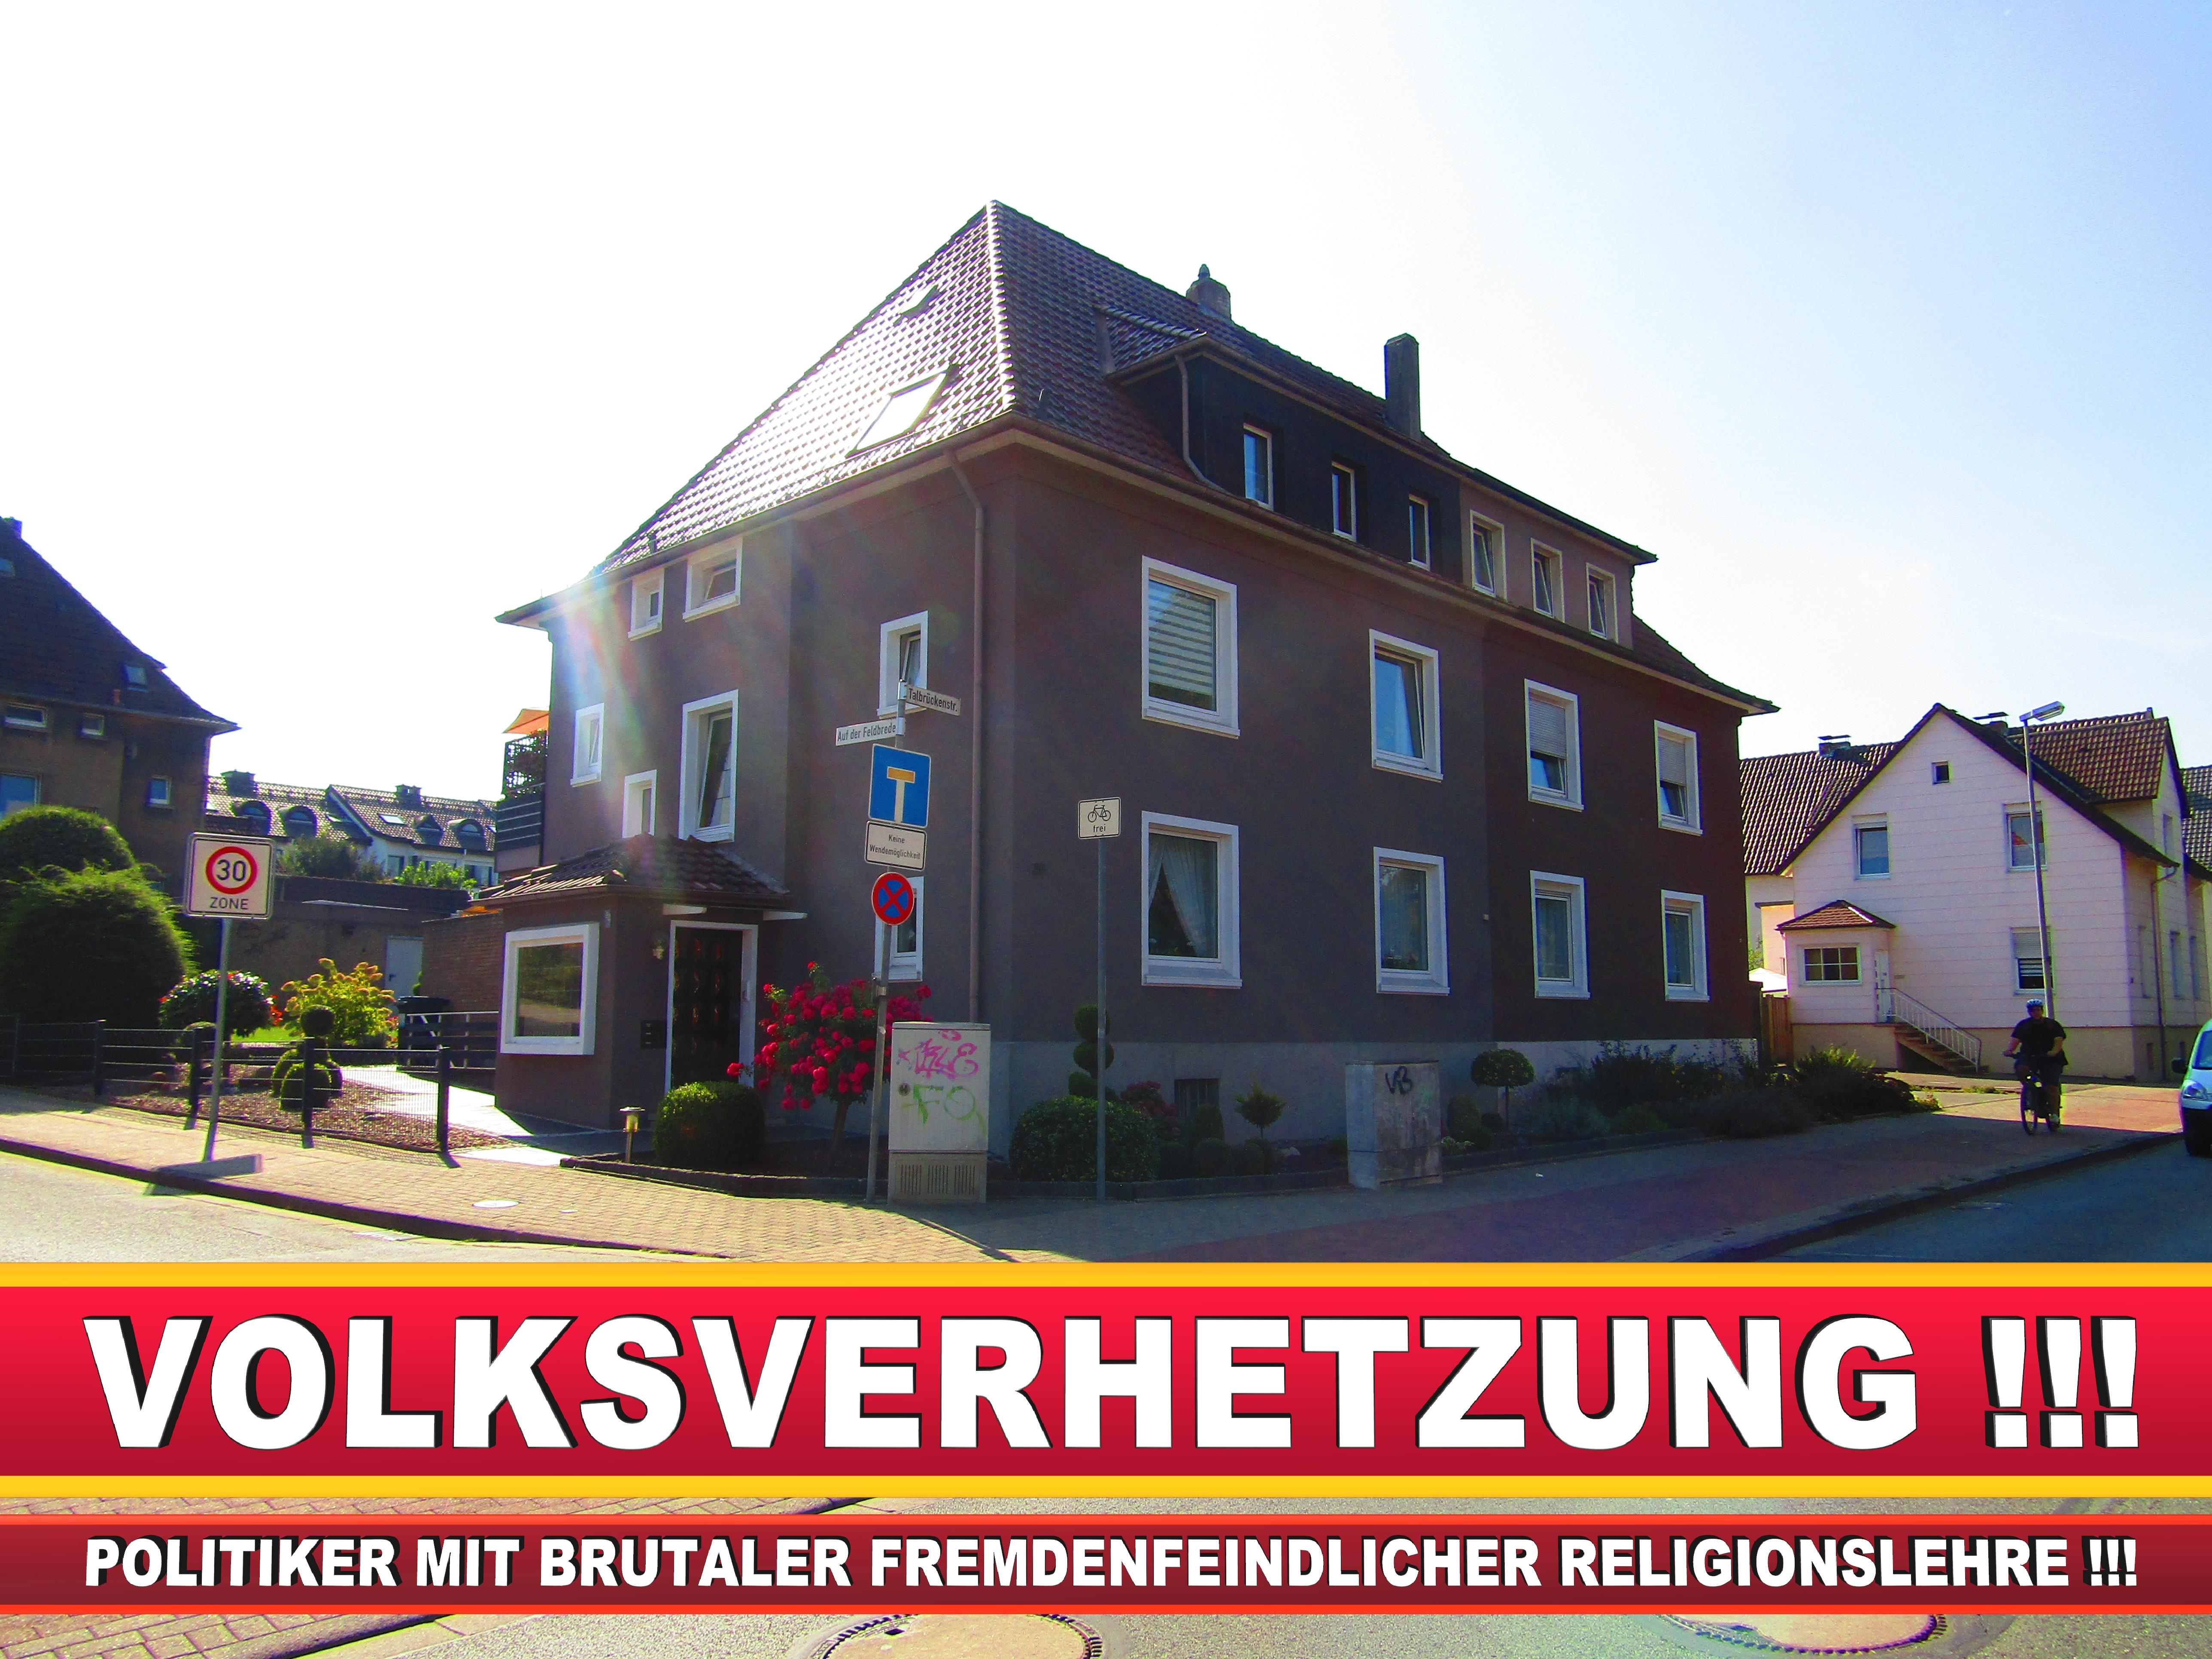 STEFAN RÖWEKAMP CDU BIELEFELD (1) LANDTAGSWAHL BUNDESTAGSWAHL BÜRGERMEISTERWAHL